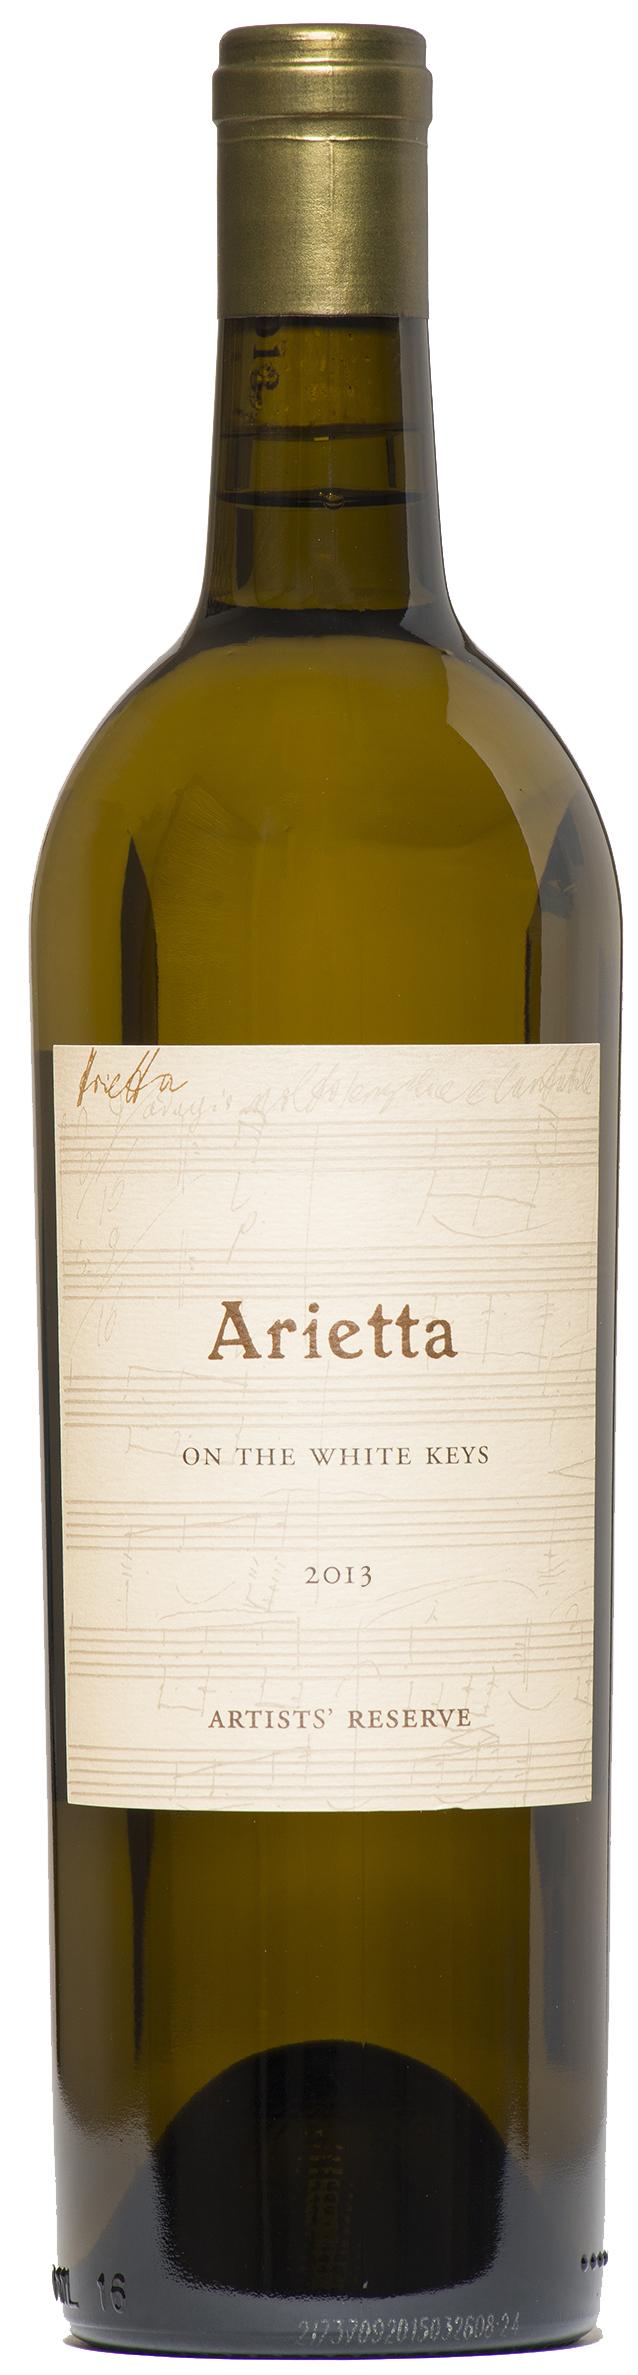 Arietta White Wine On the White Keys Artists Reserve 2013